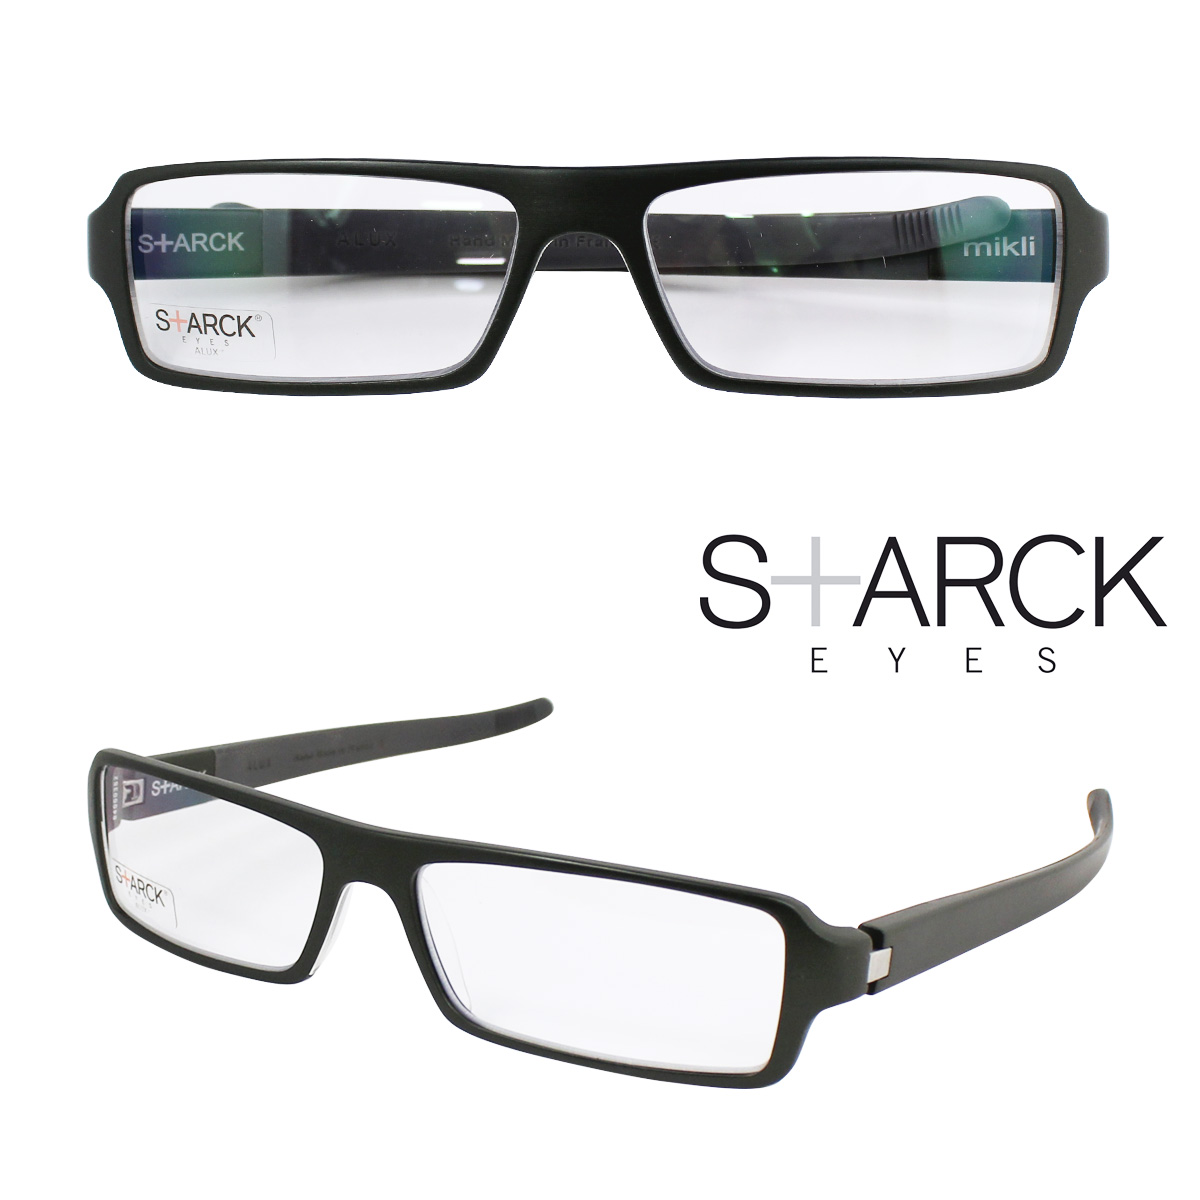 [SOLD OUT]滑石眼睛STARCK EYES arammikurimegane眼鏡法國製造人分歧D